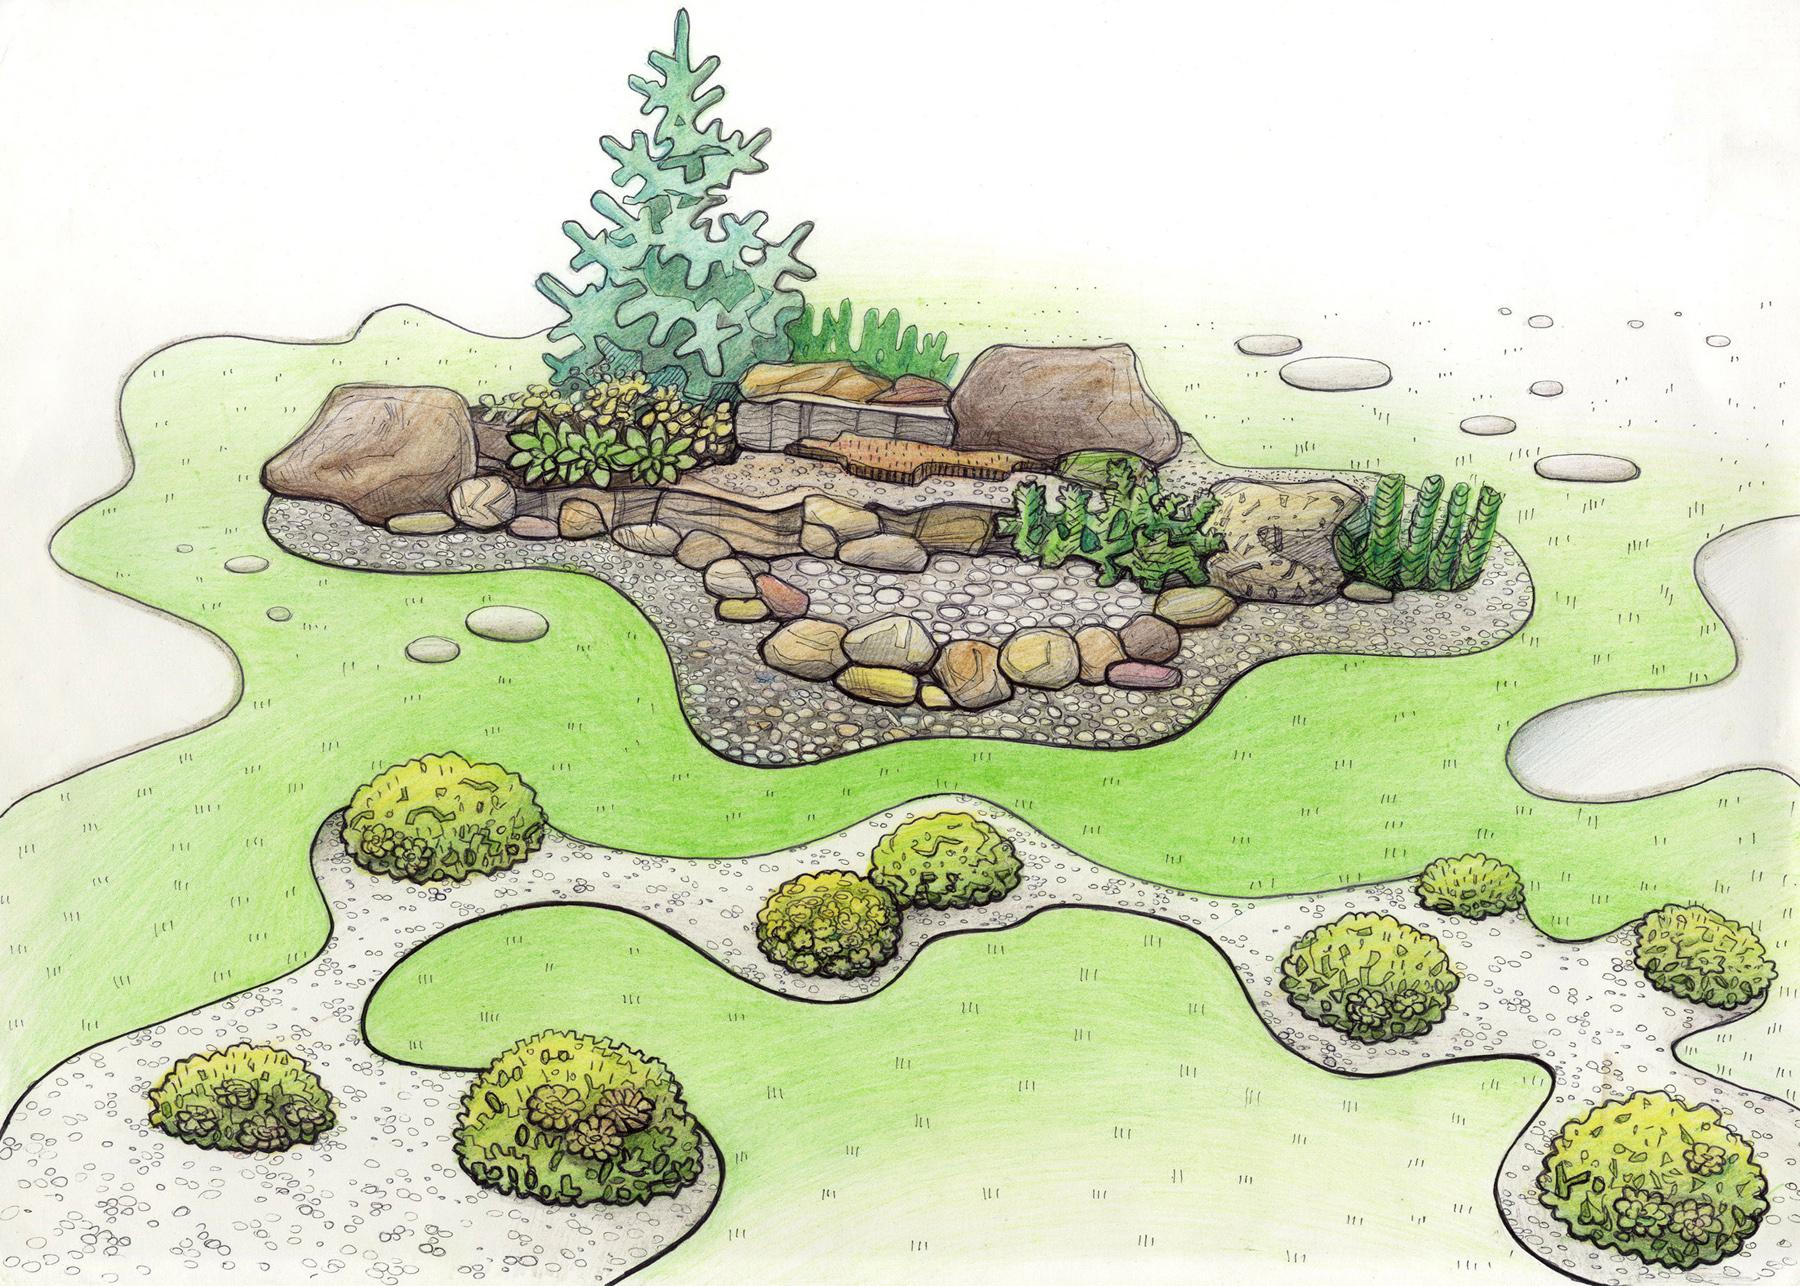 Эскиз ландшафтного дизайна